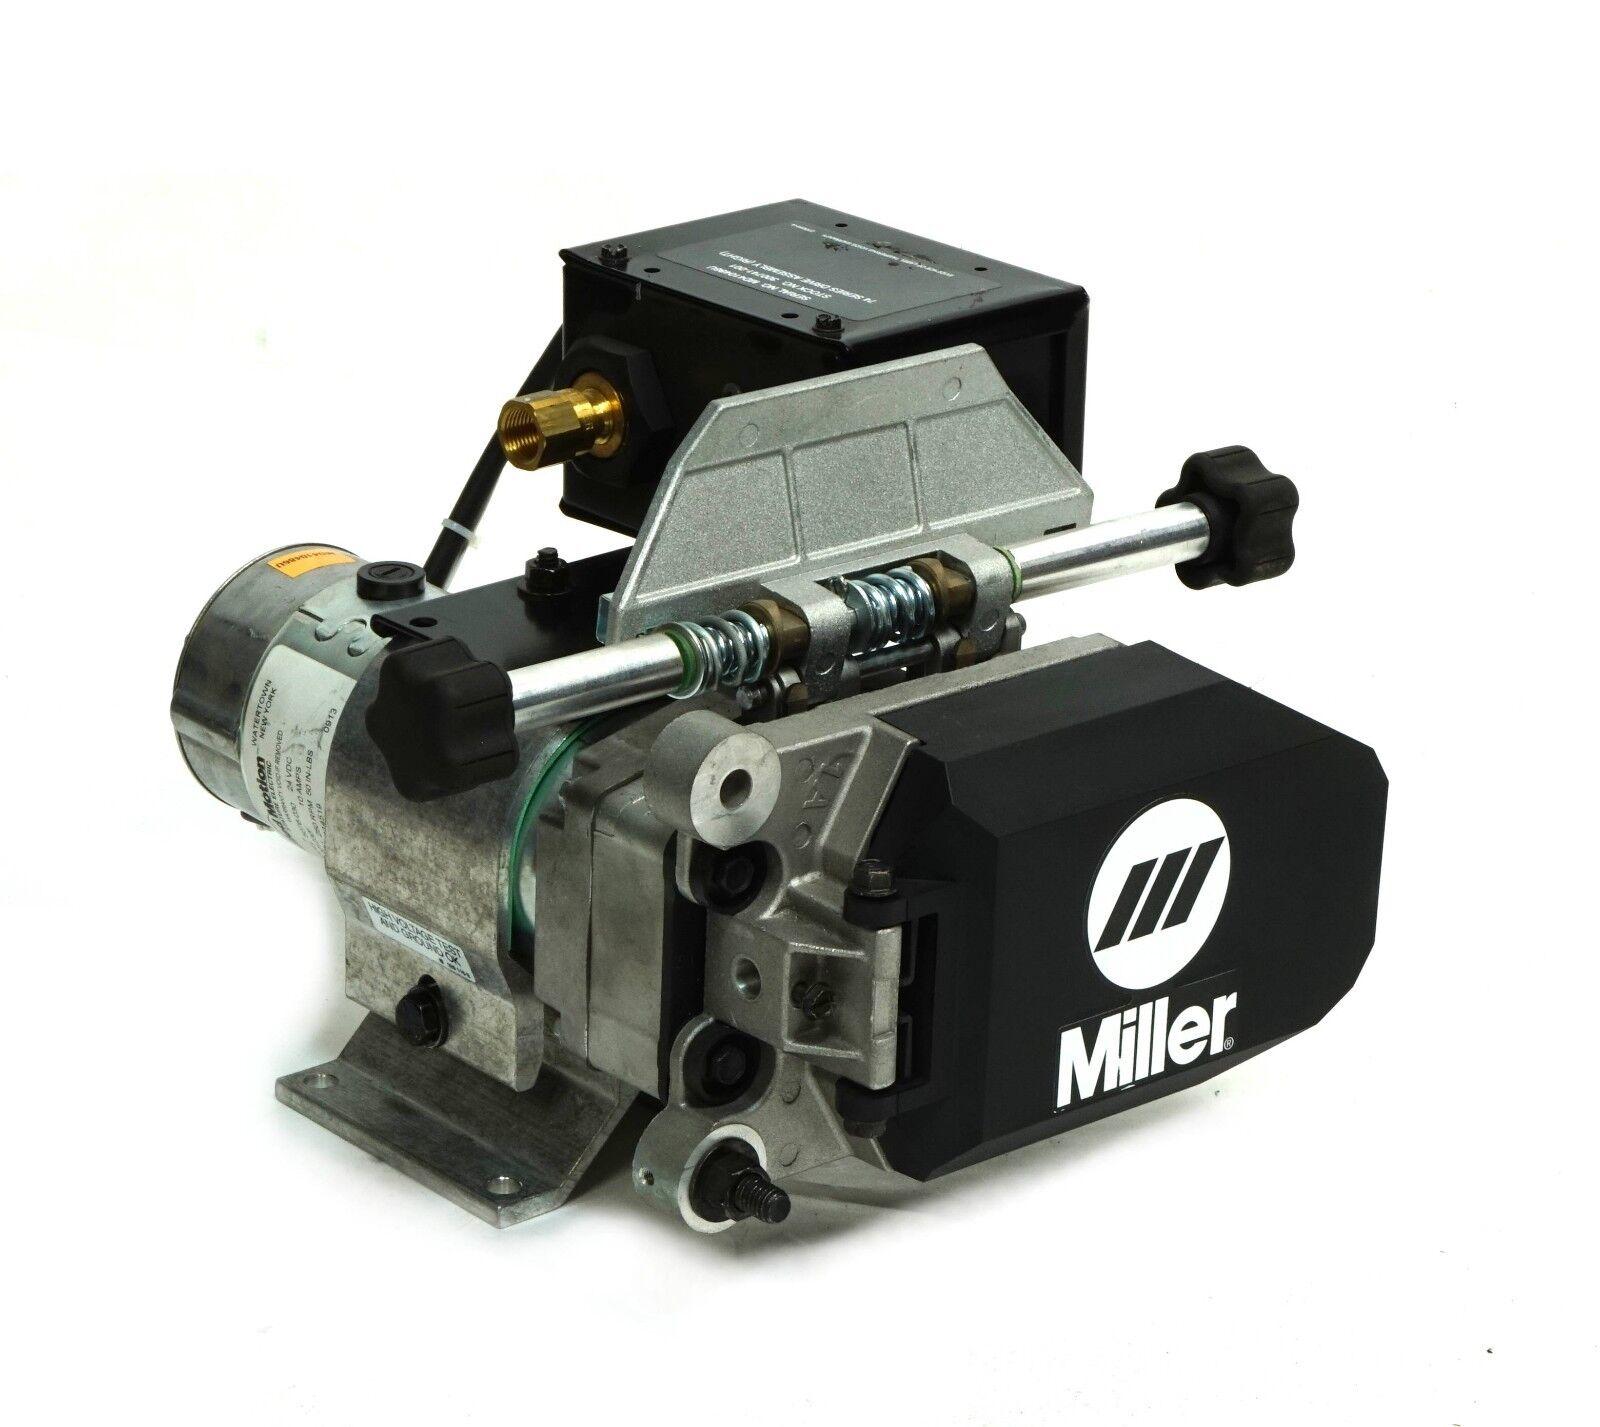 Miller 74 Series, 300741-001, motor assembly